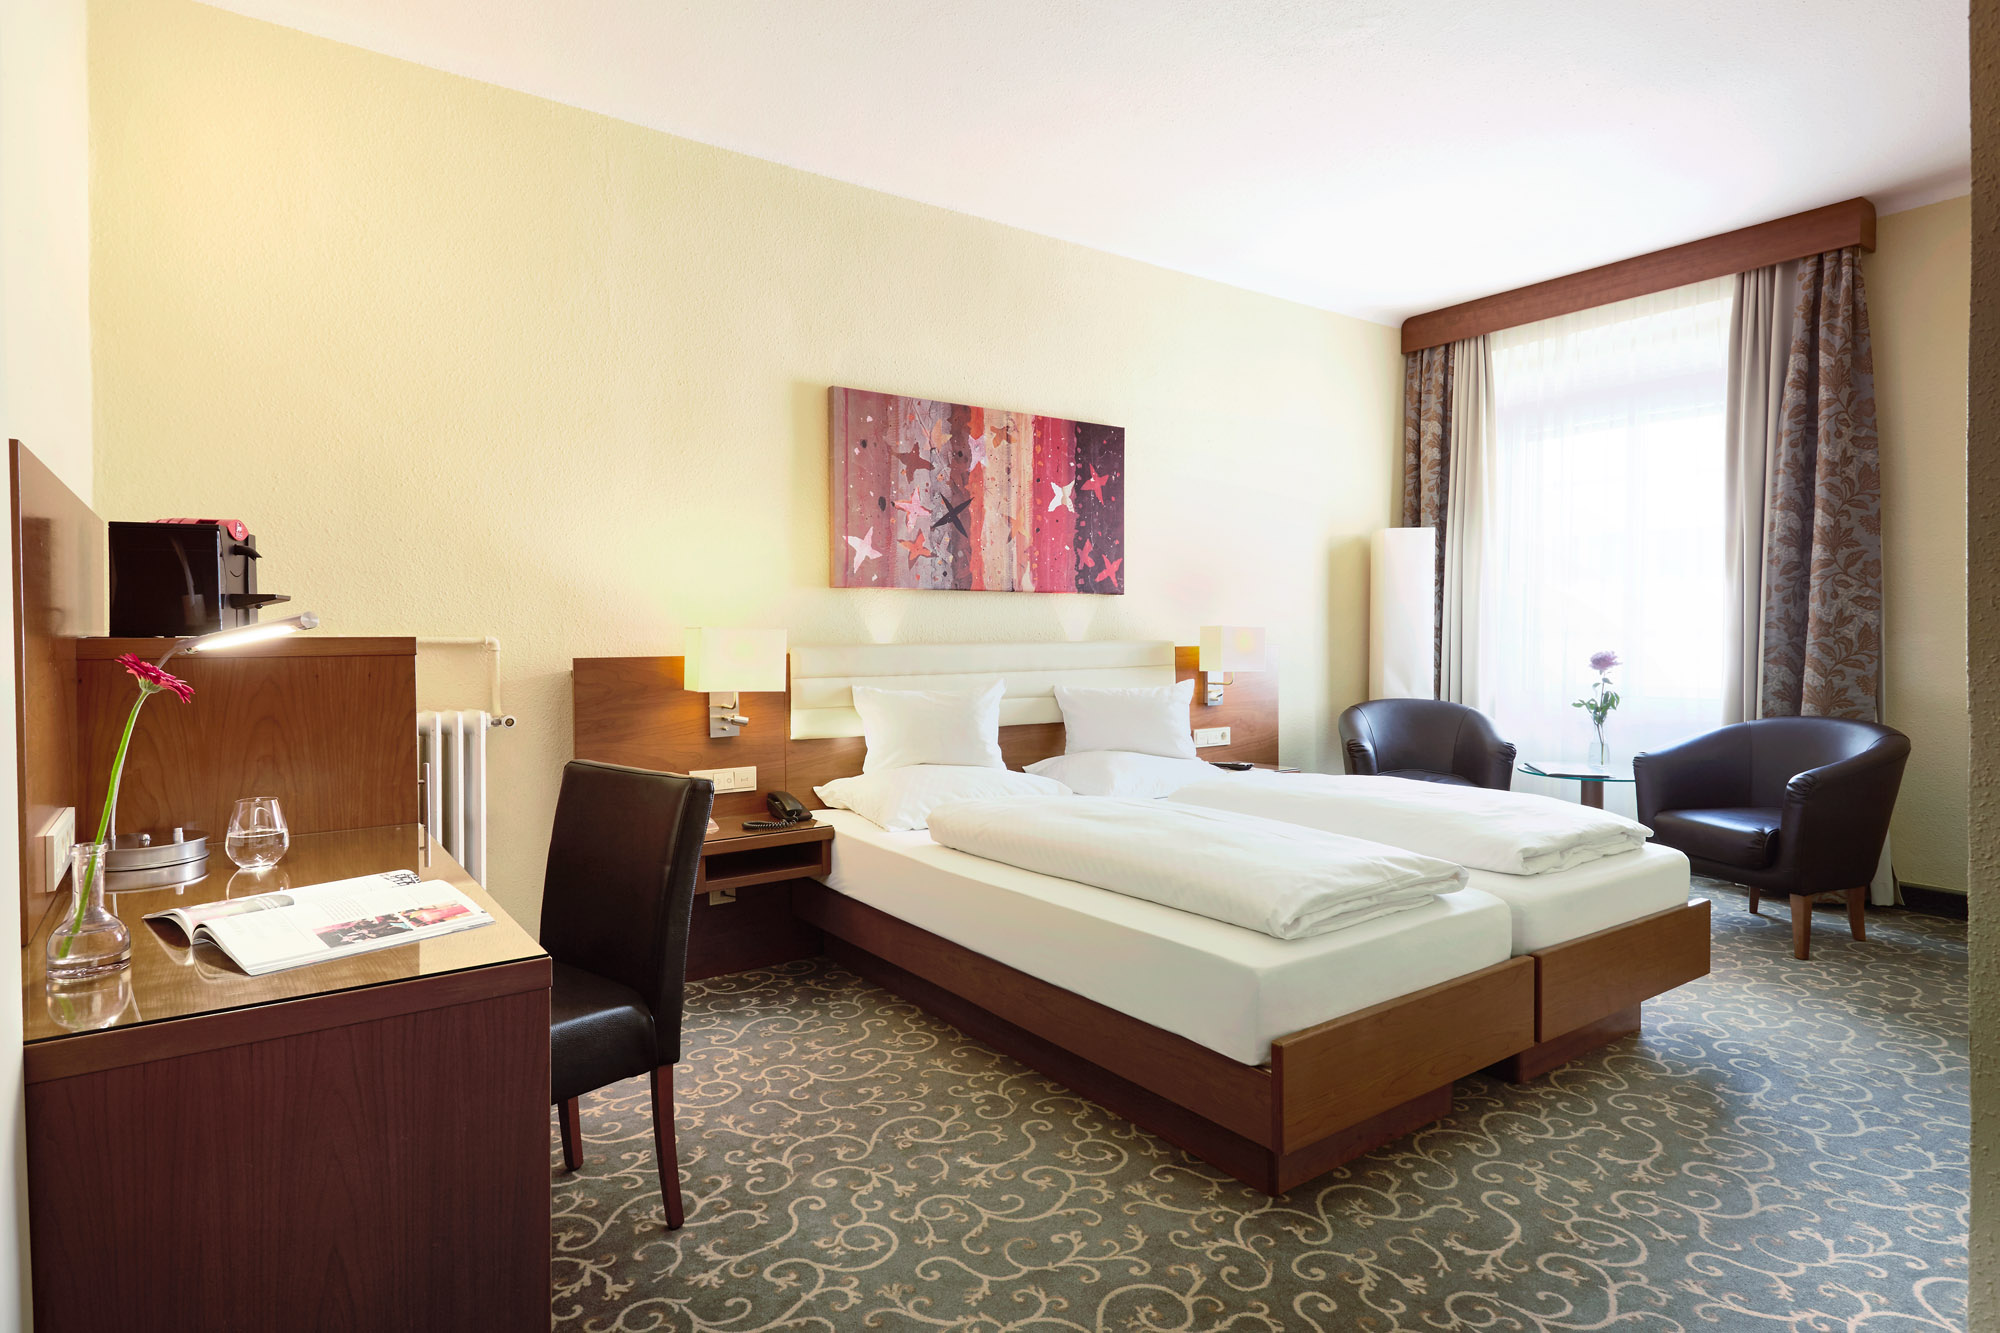 Doppelzimmer Classic ab € 118,50 pro Nacht inklusive Frühstück & Ortstaxe